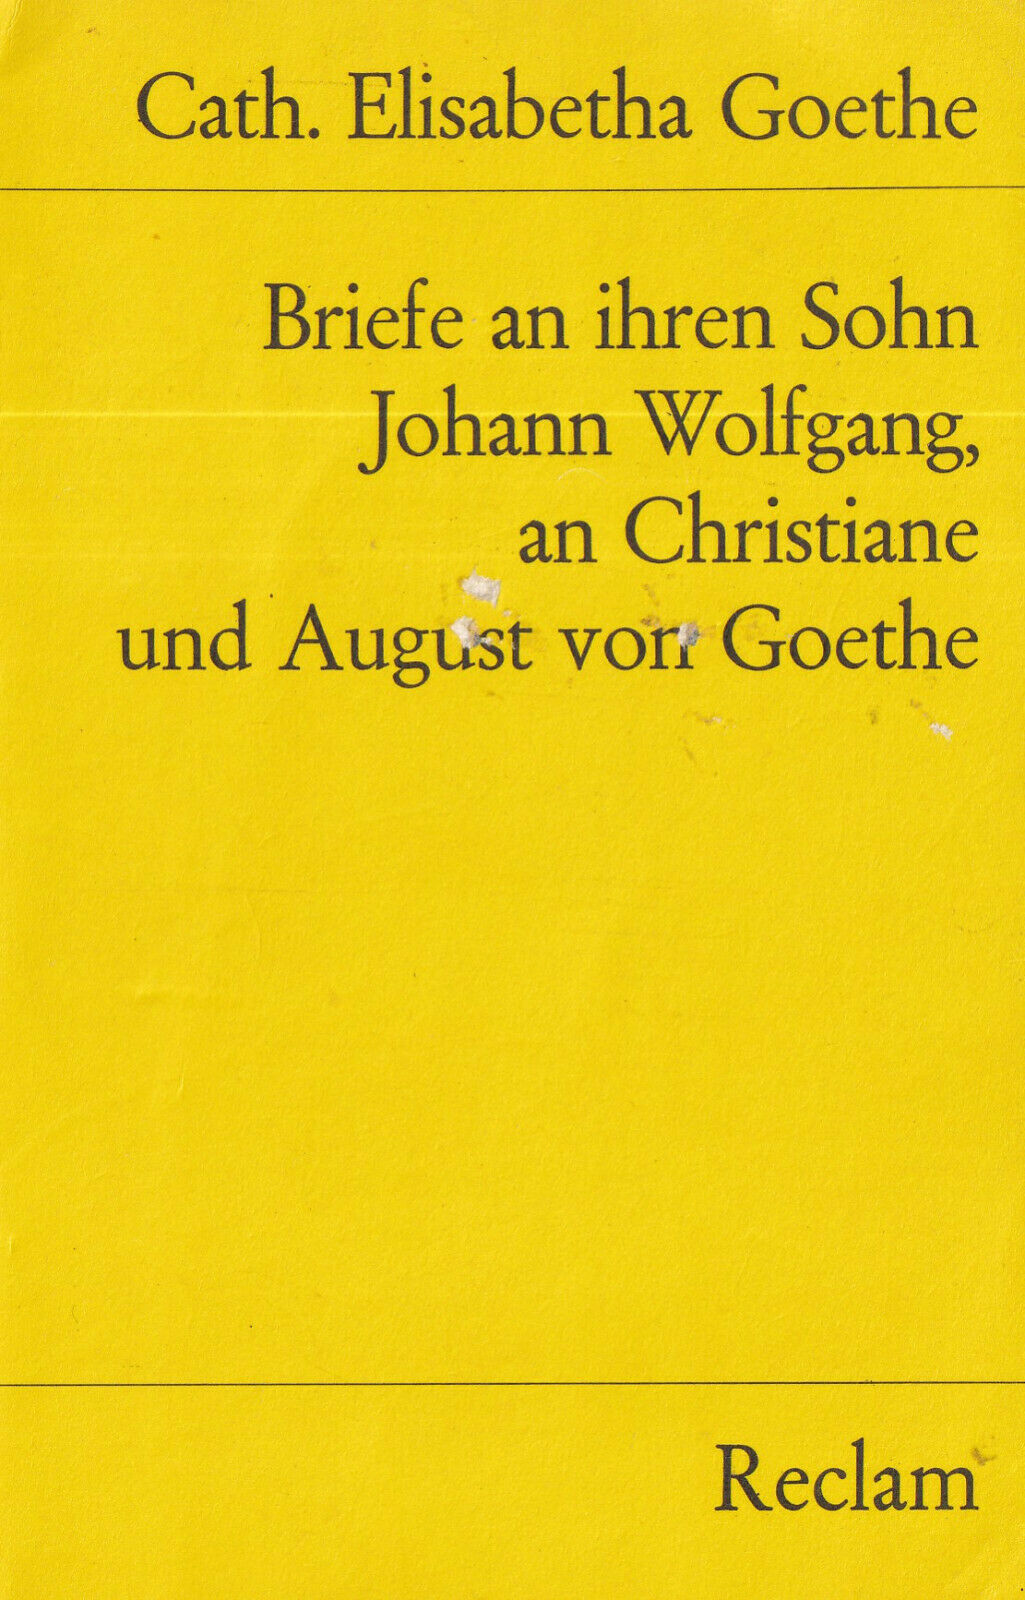 Reclam- 02786 C.E. GOETHE : BRIEFE AN JOHANN WOLFGANG, CHRISTIANE UND AUGUST a